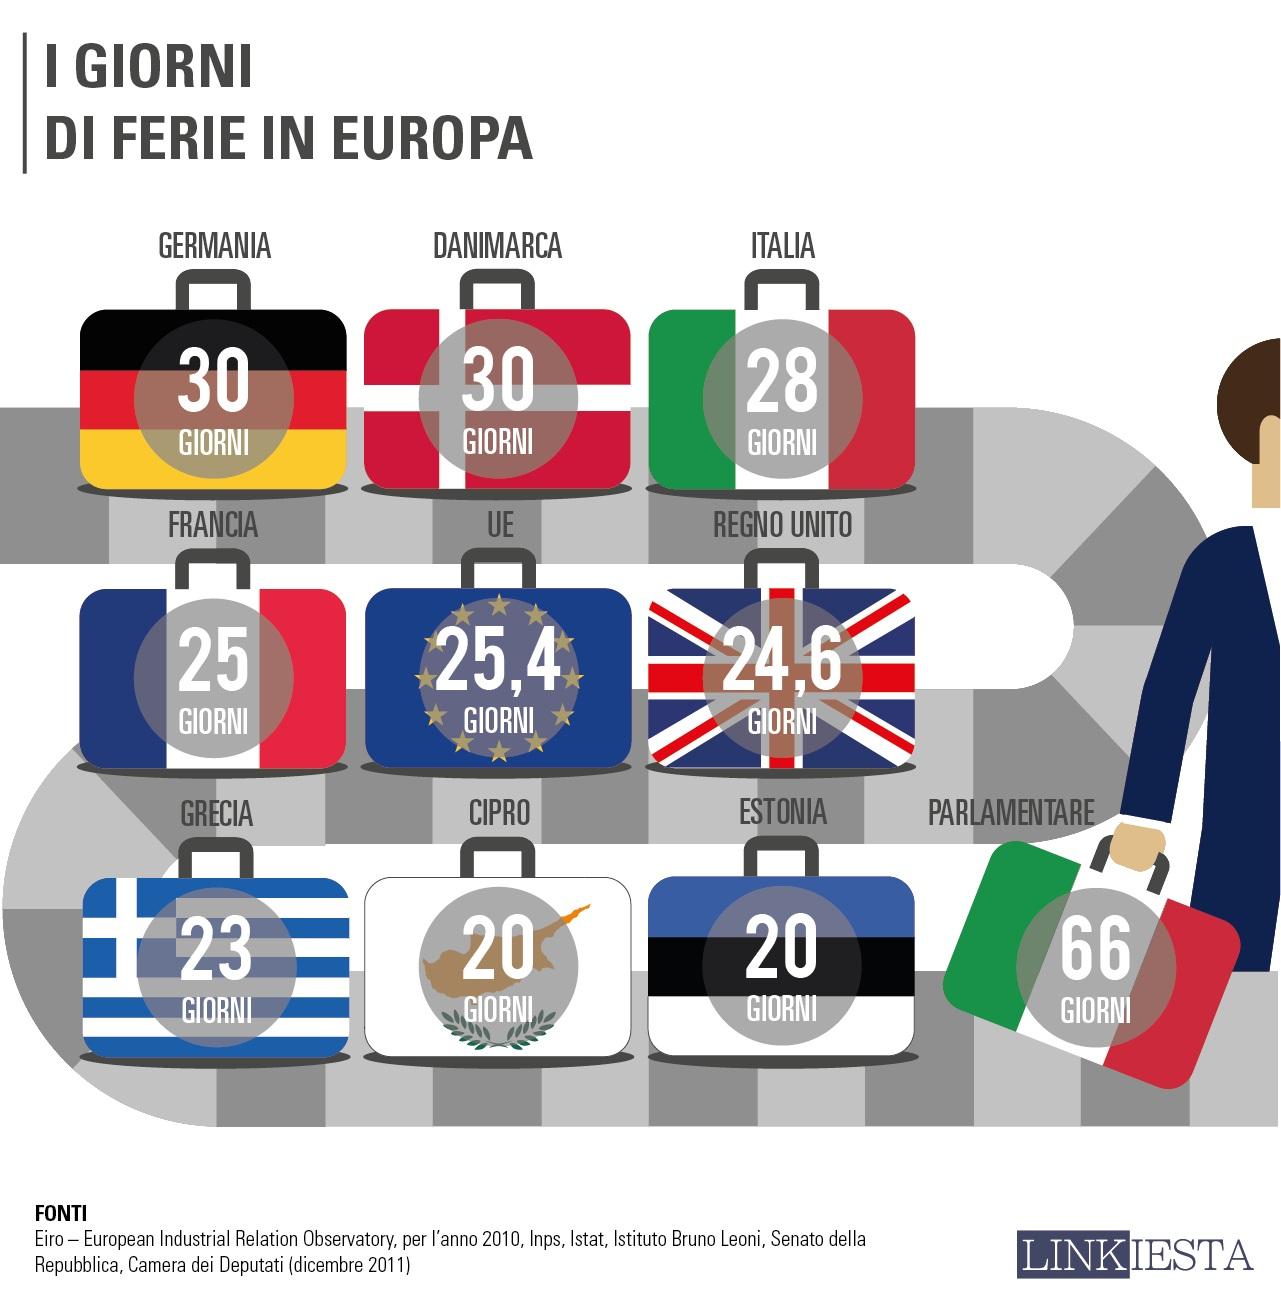 Giorni di ferie in Europa